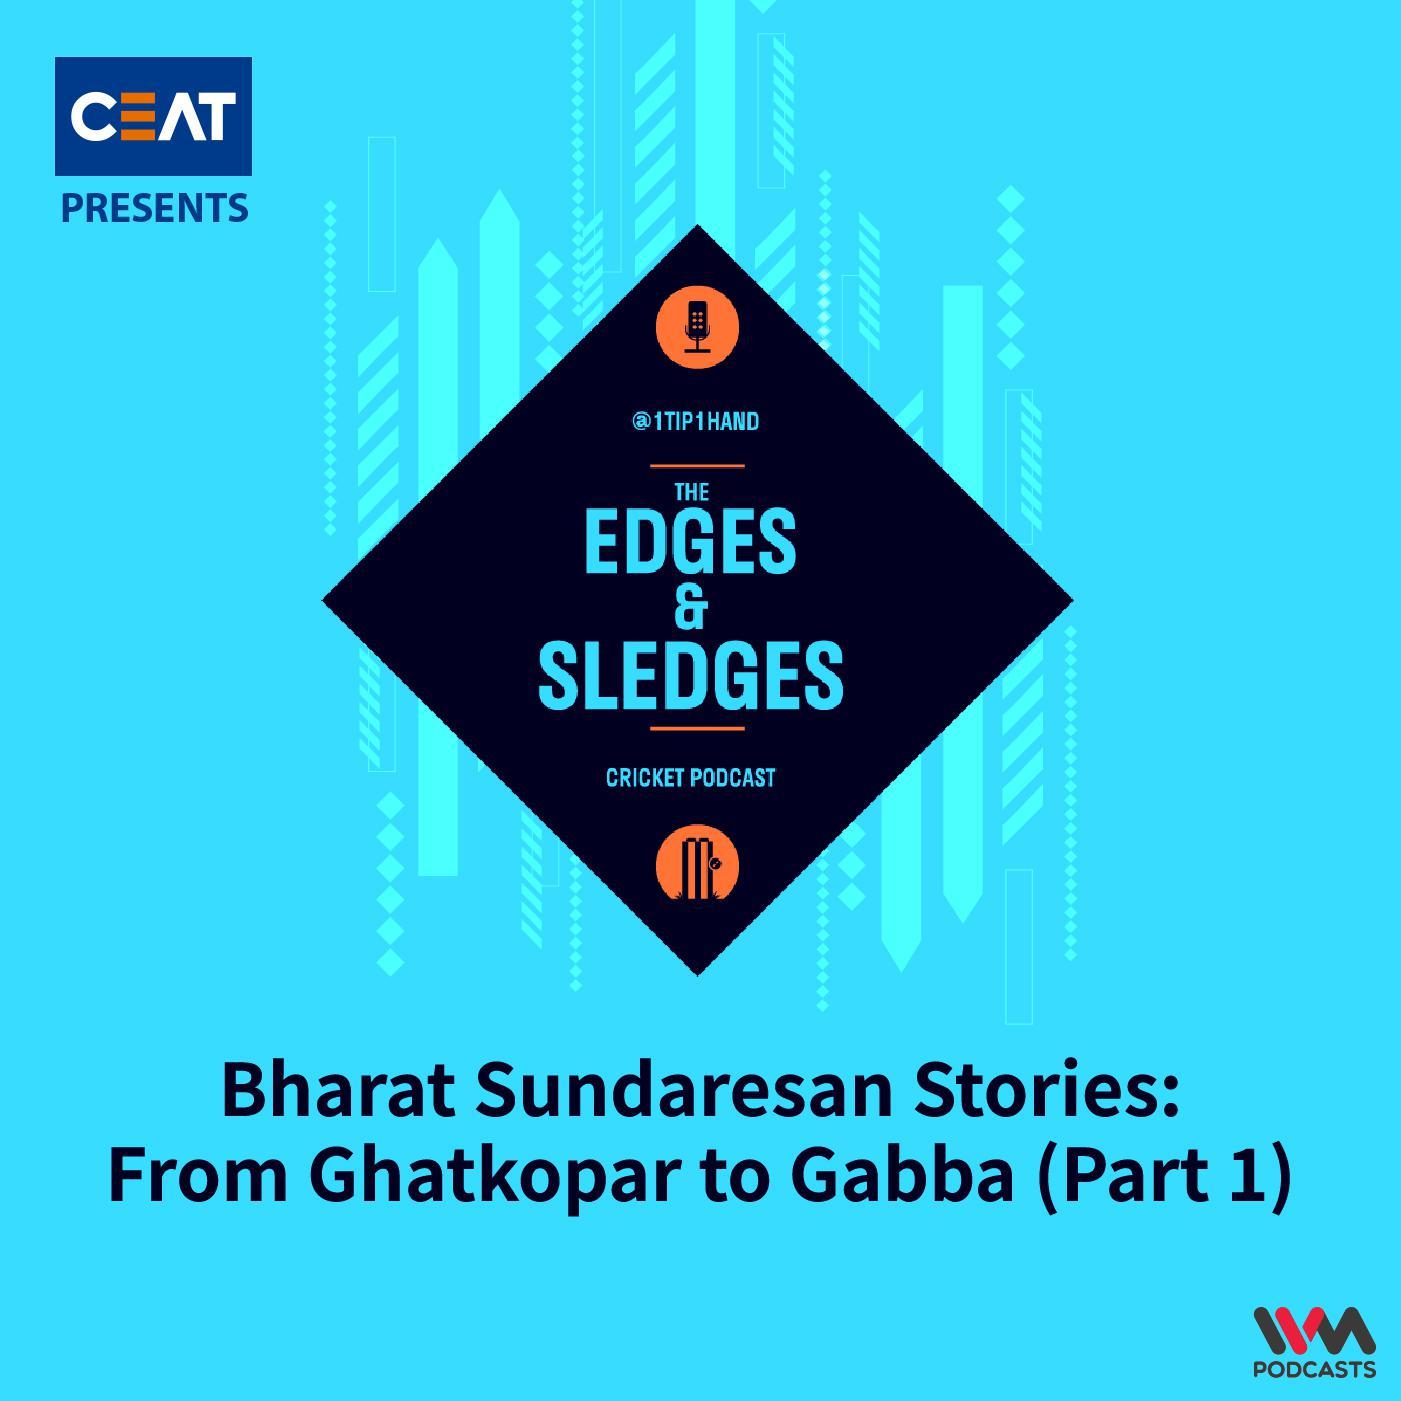 Ep. 175: Bharat Sundaresan Stories: From Ghatkopar to Gabba (Part 1)